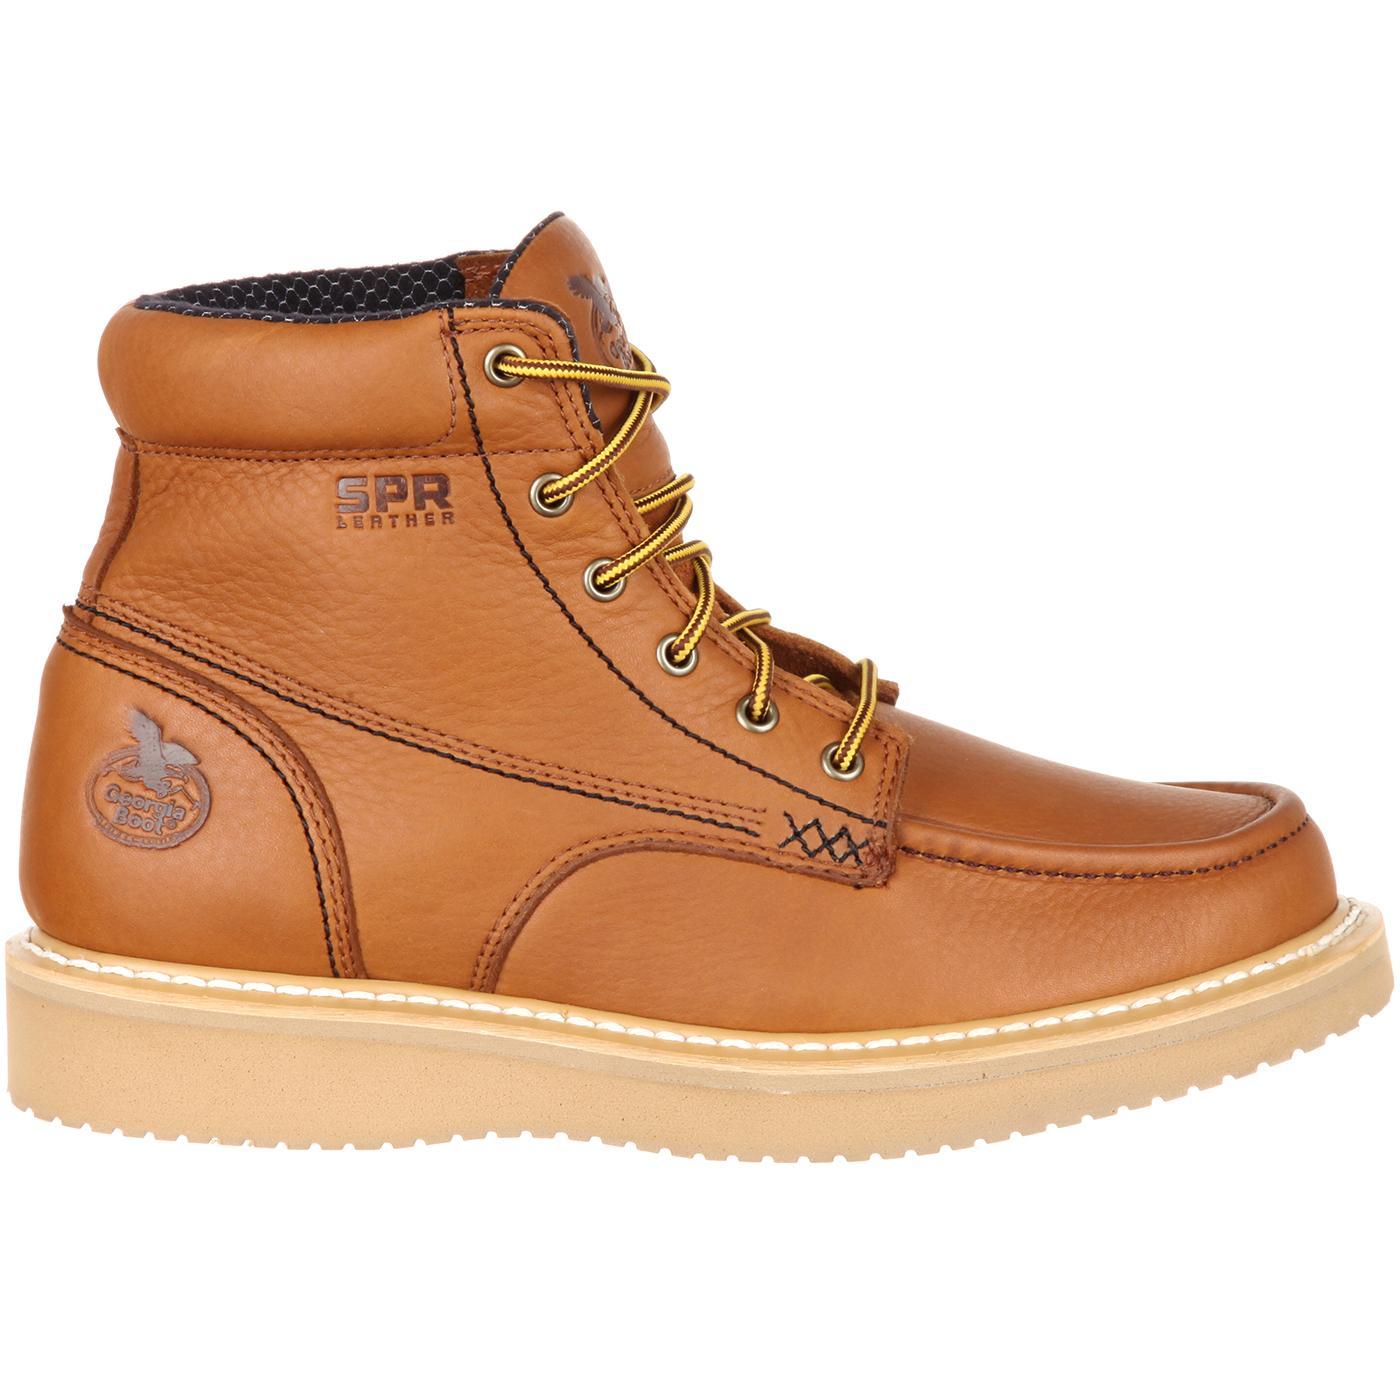 cf151c4284a Georgia Boot  Men s Moc-toe Wedge Work Boot